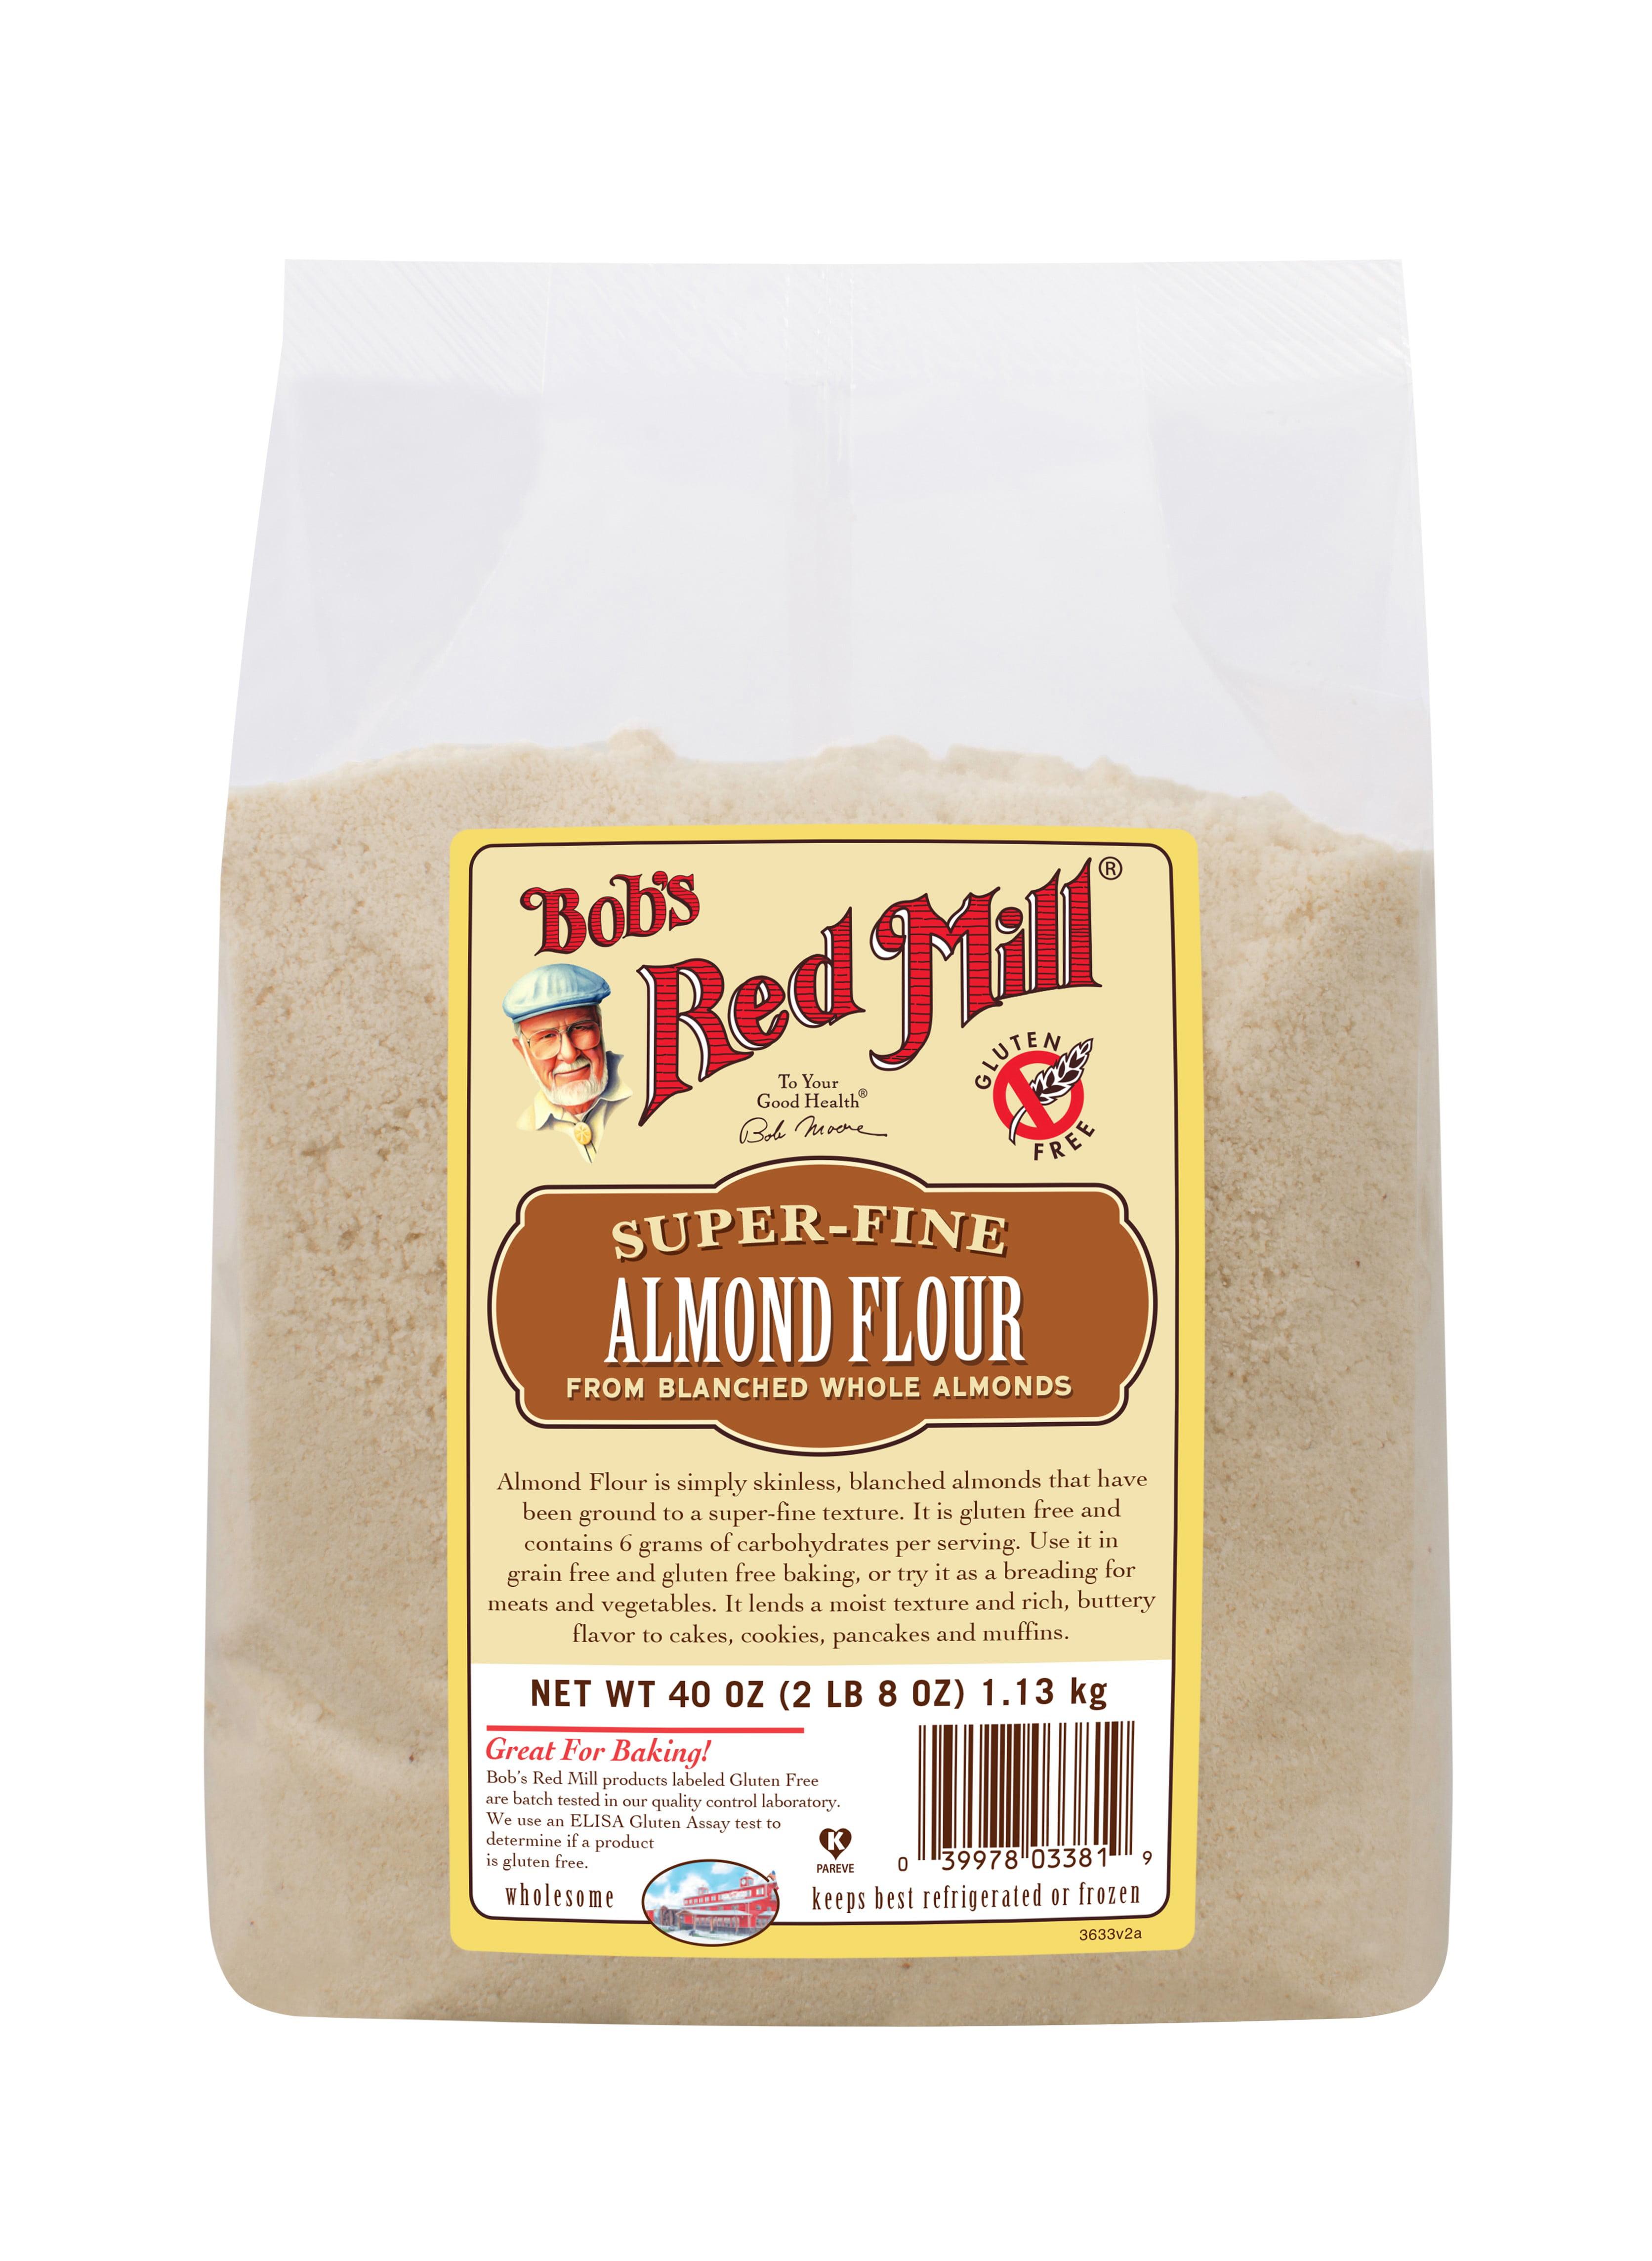 Bobs Red Mill Super Fine Almond Flour, 40 Oz - Walmart.com